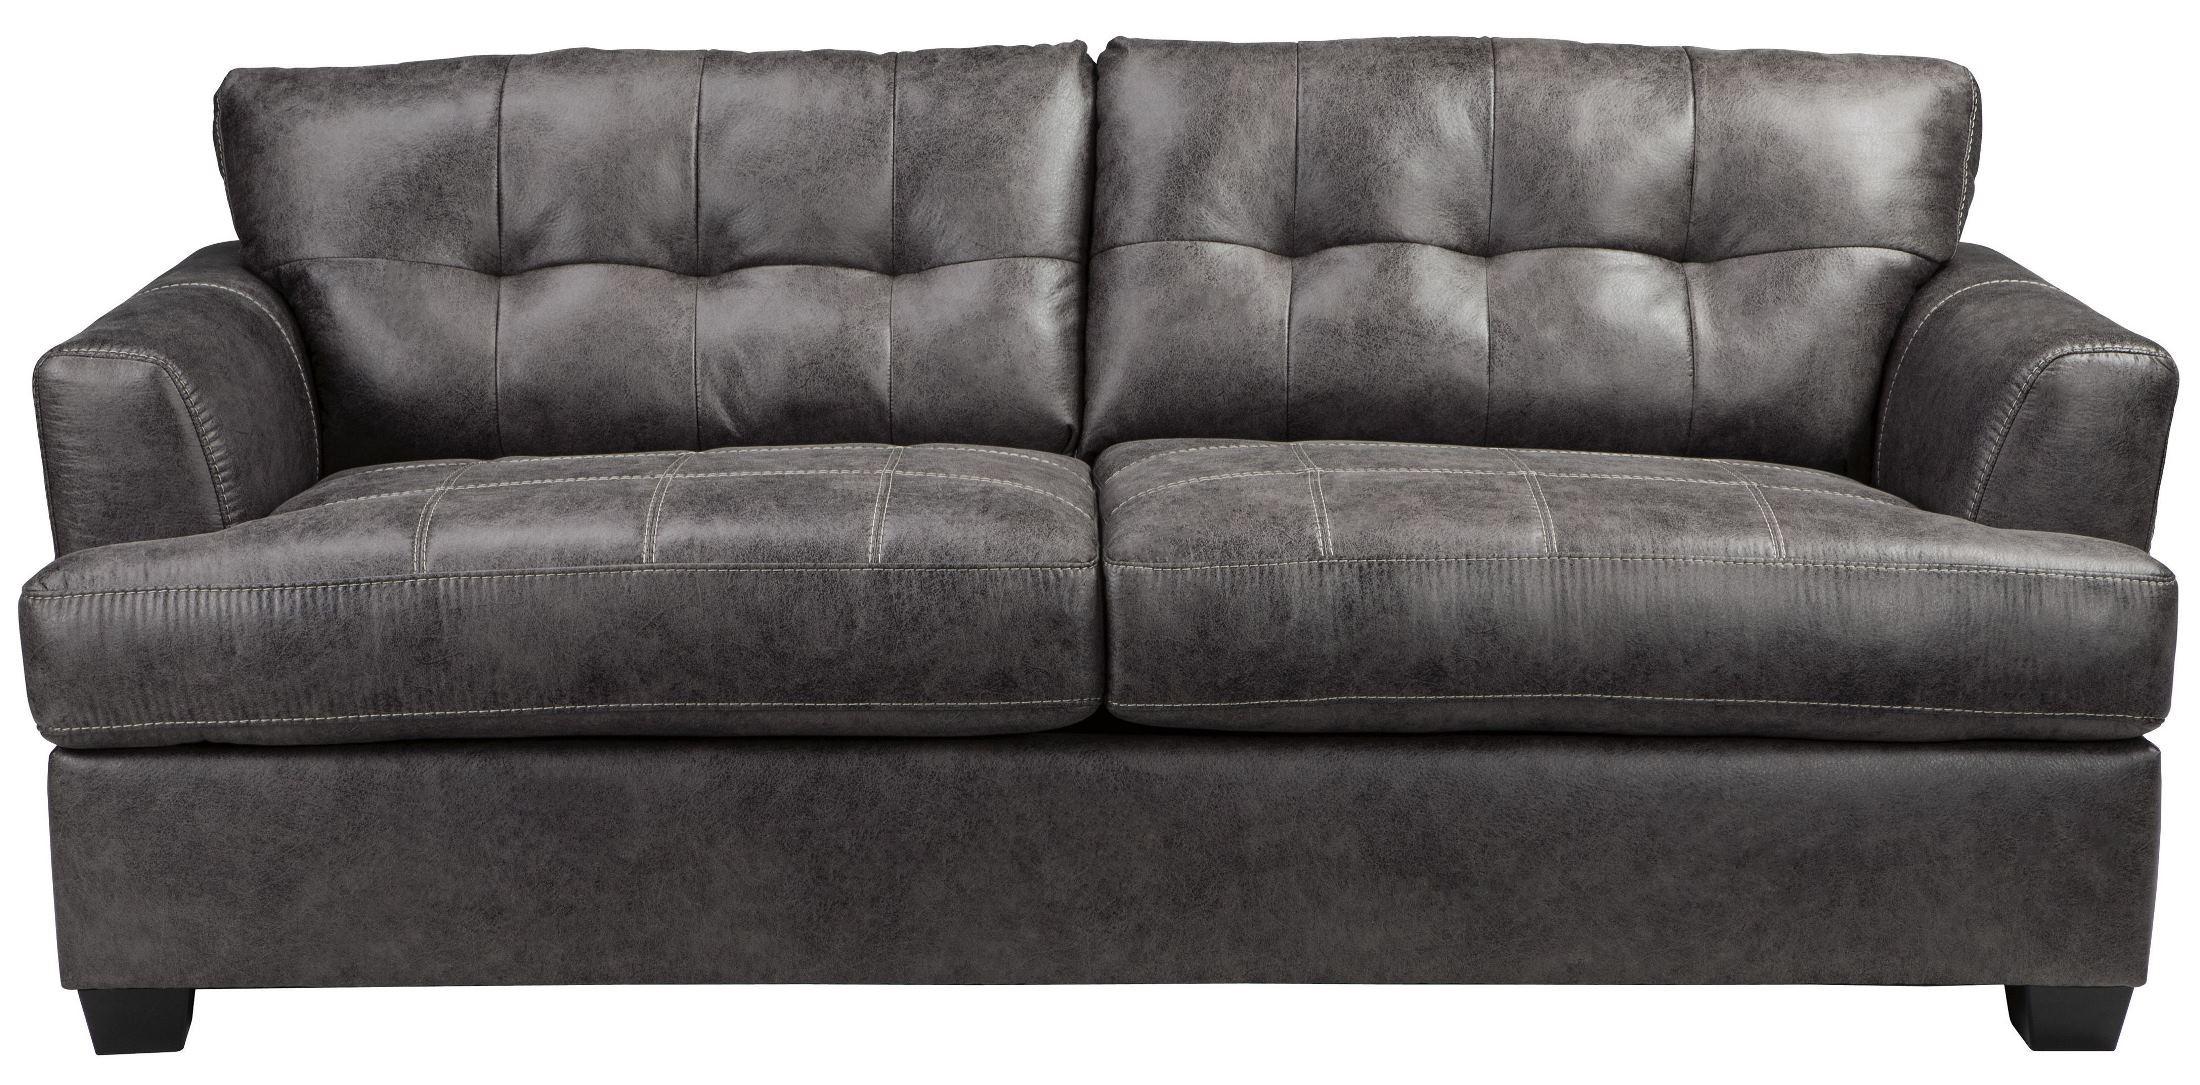 Inmon Charcoal Sofa from Ashley